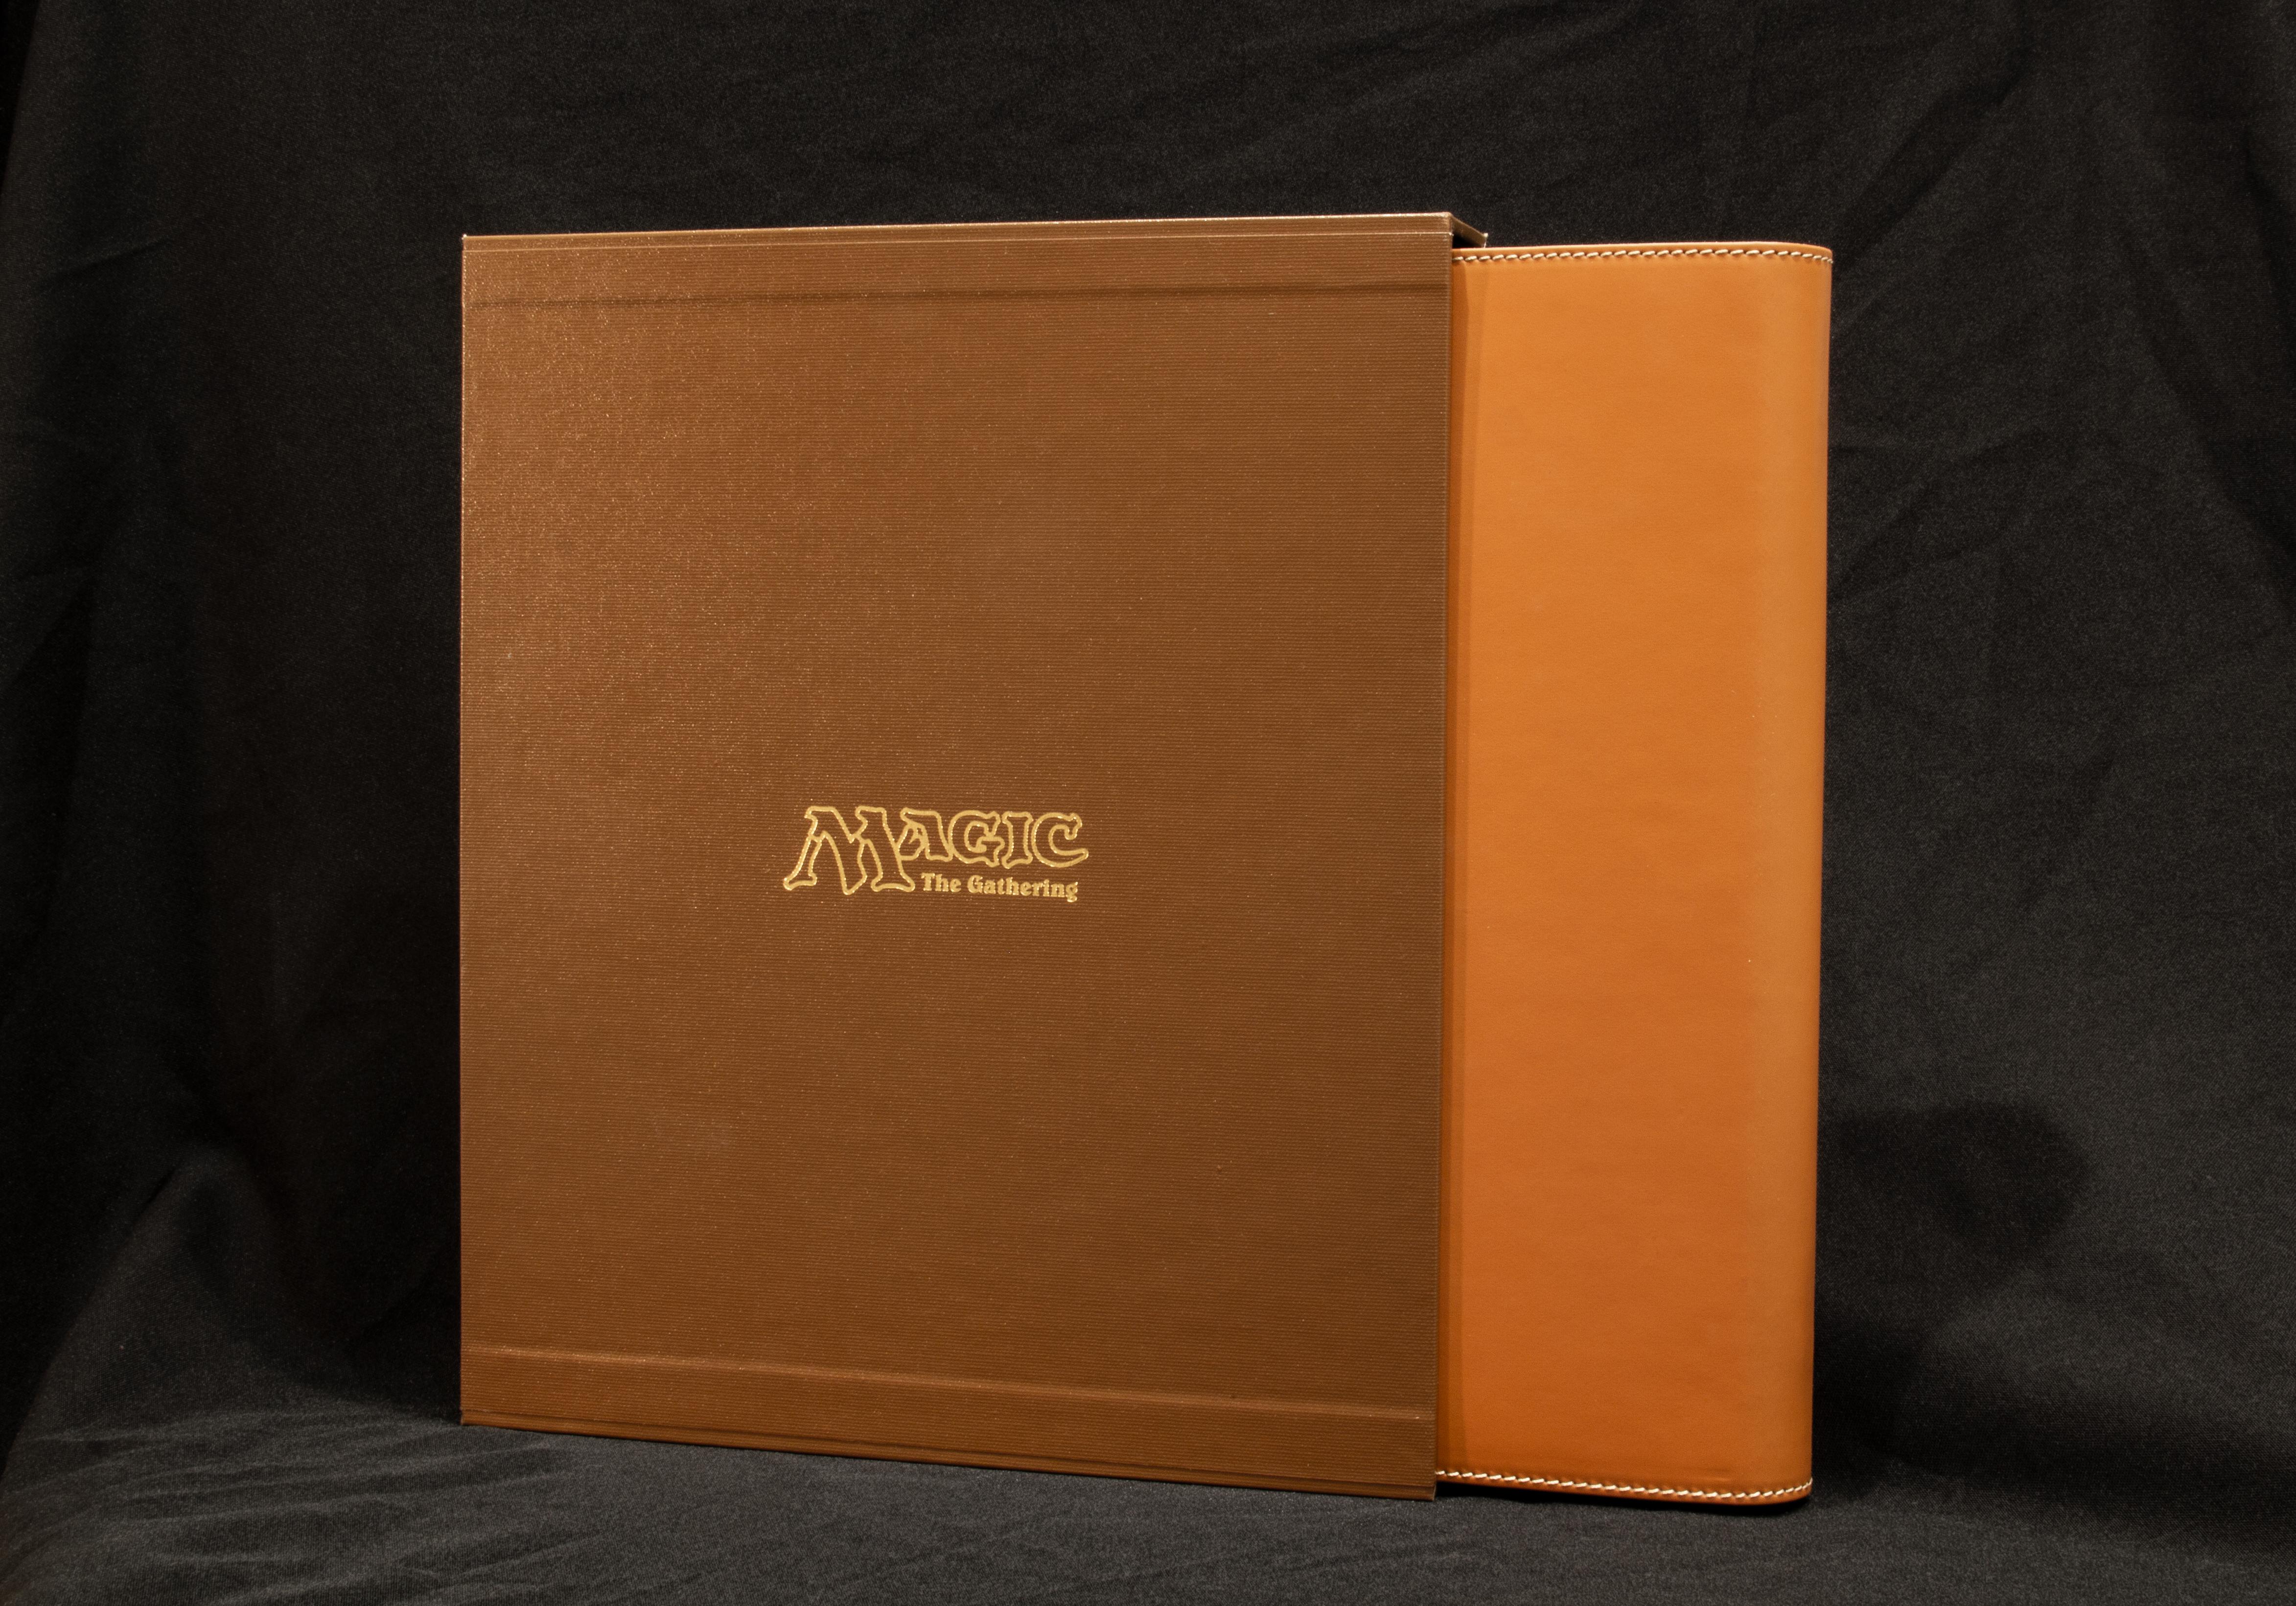 Slipcase and Tan option binder